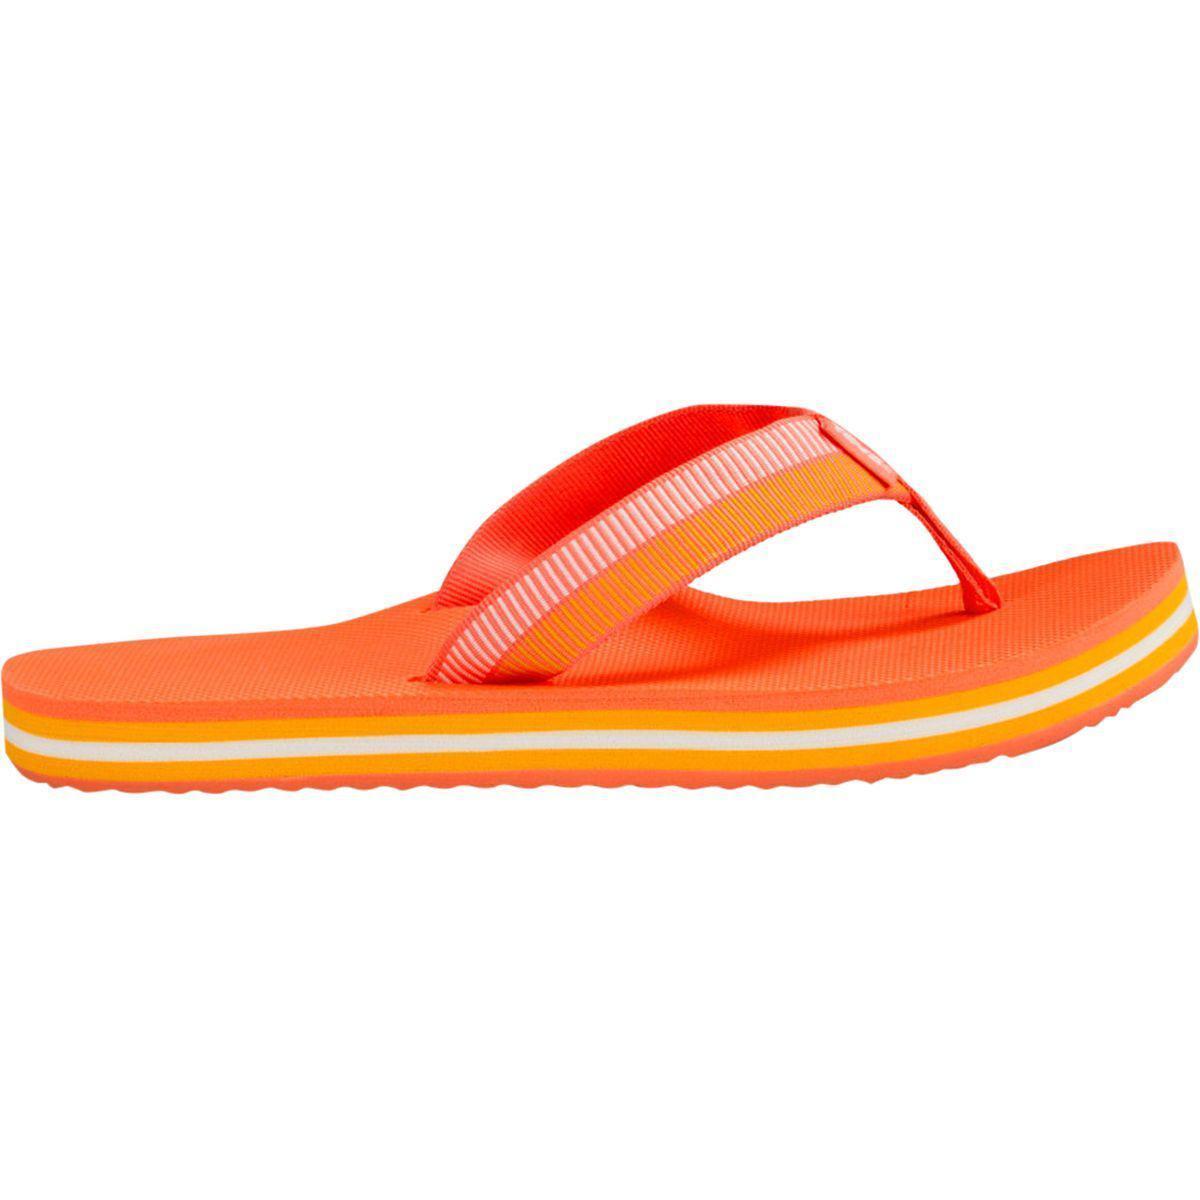 6be97c7d07124 Lyst - Teva Deckers Flip Flop in Orange